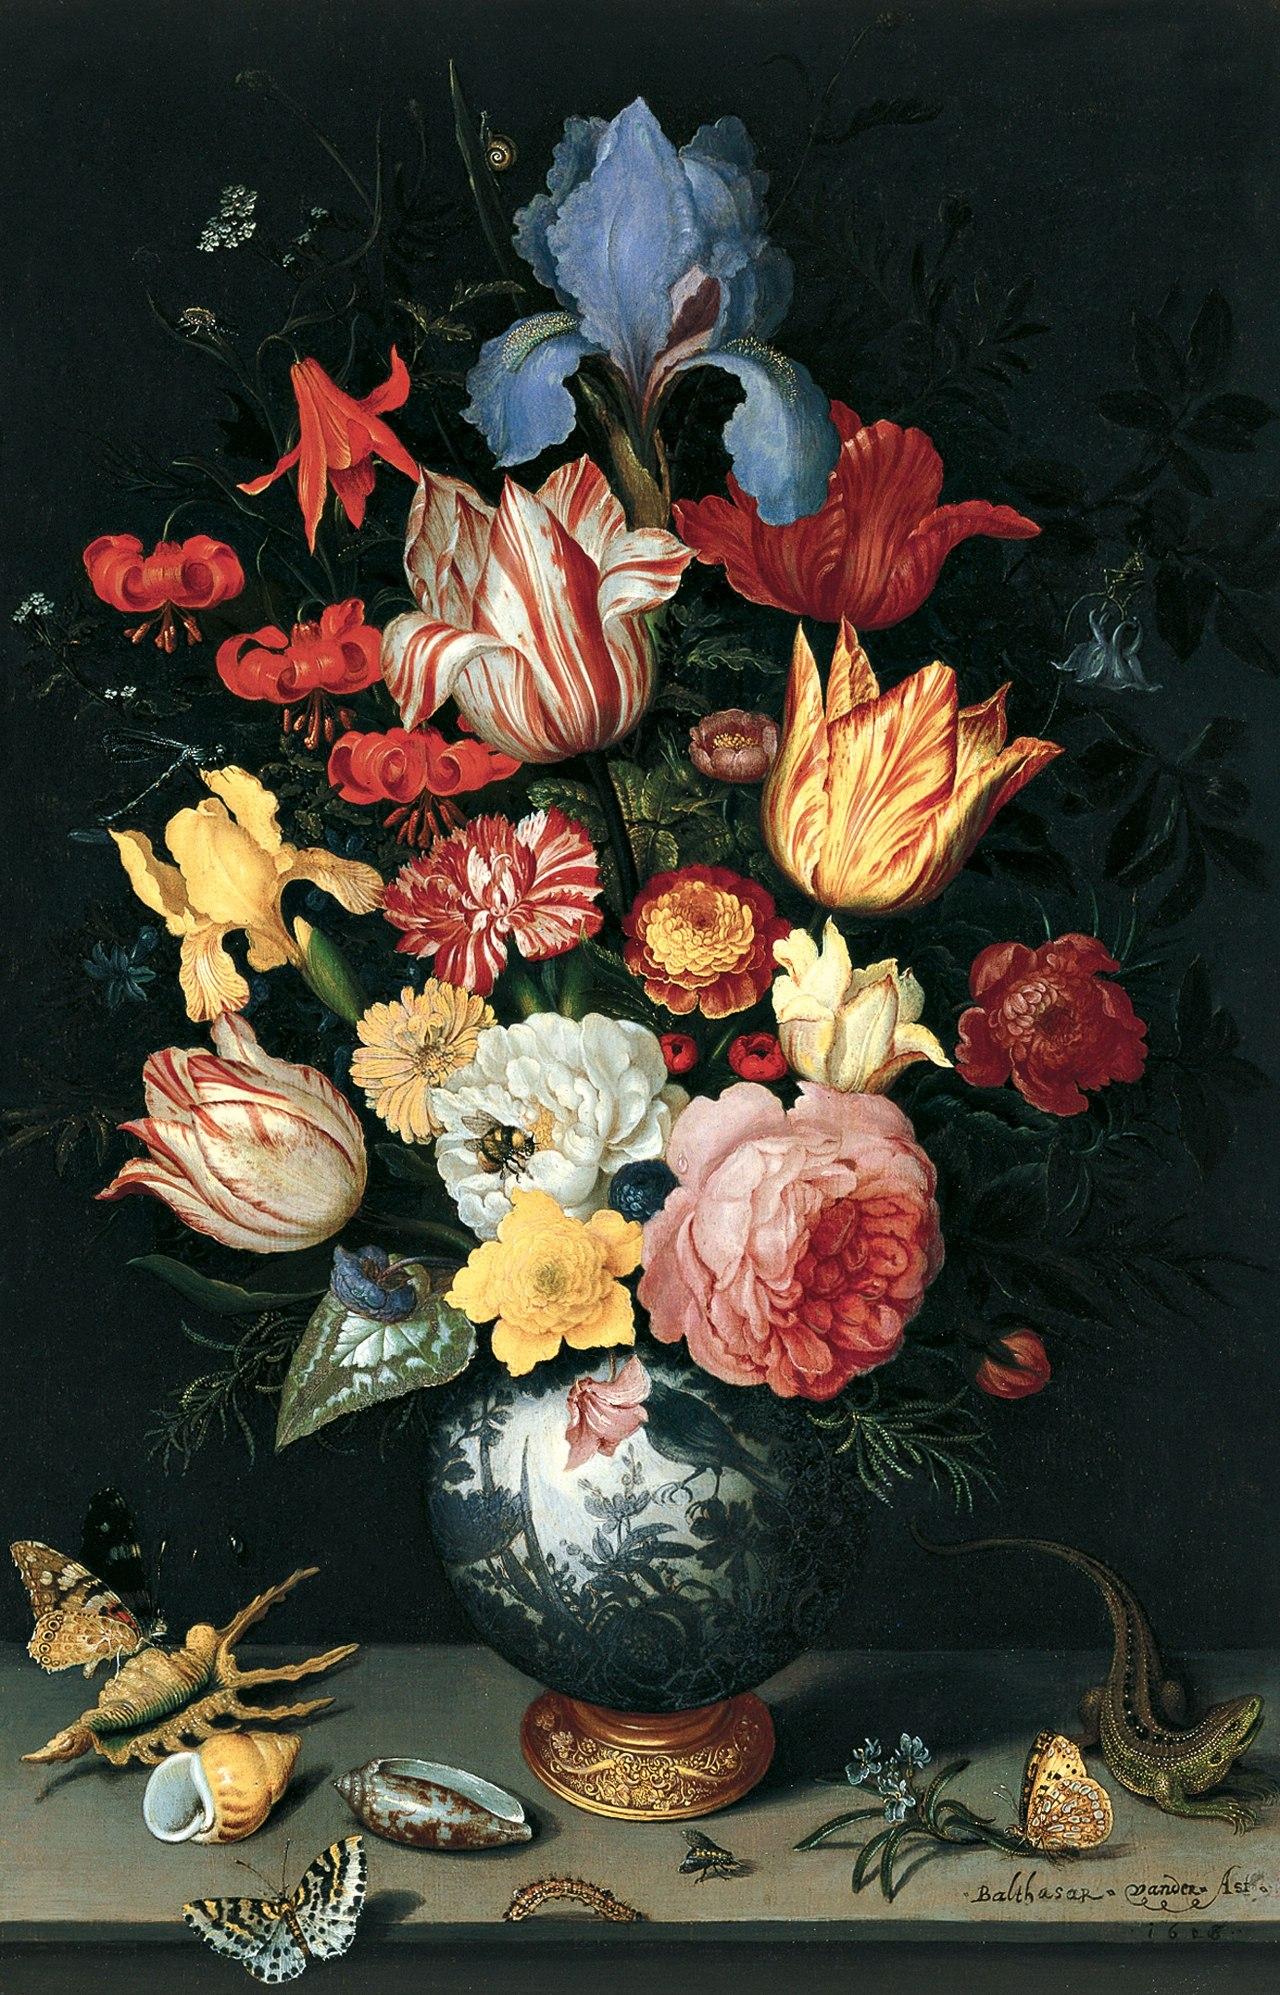 Shell n flower photo